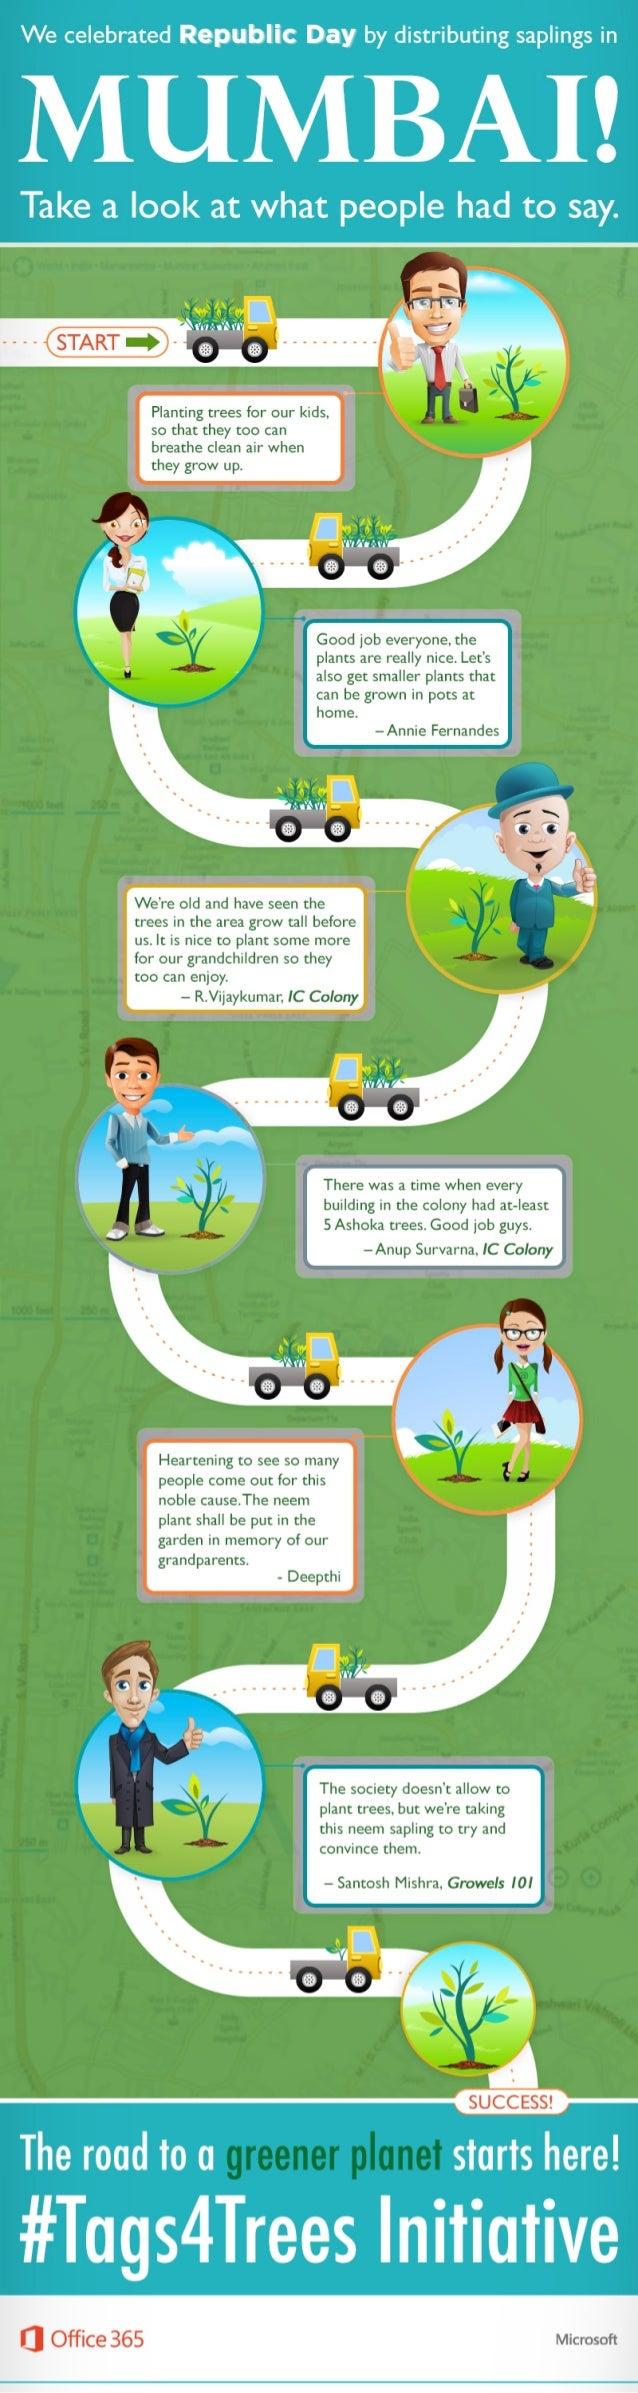 Microsoft Campaign - #Tags4Trees